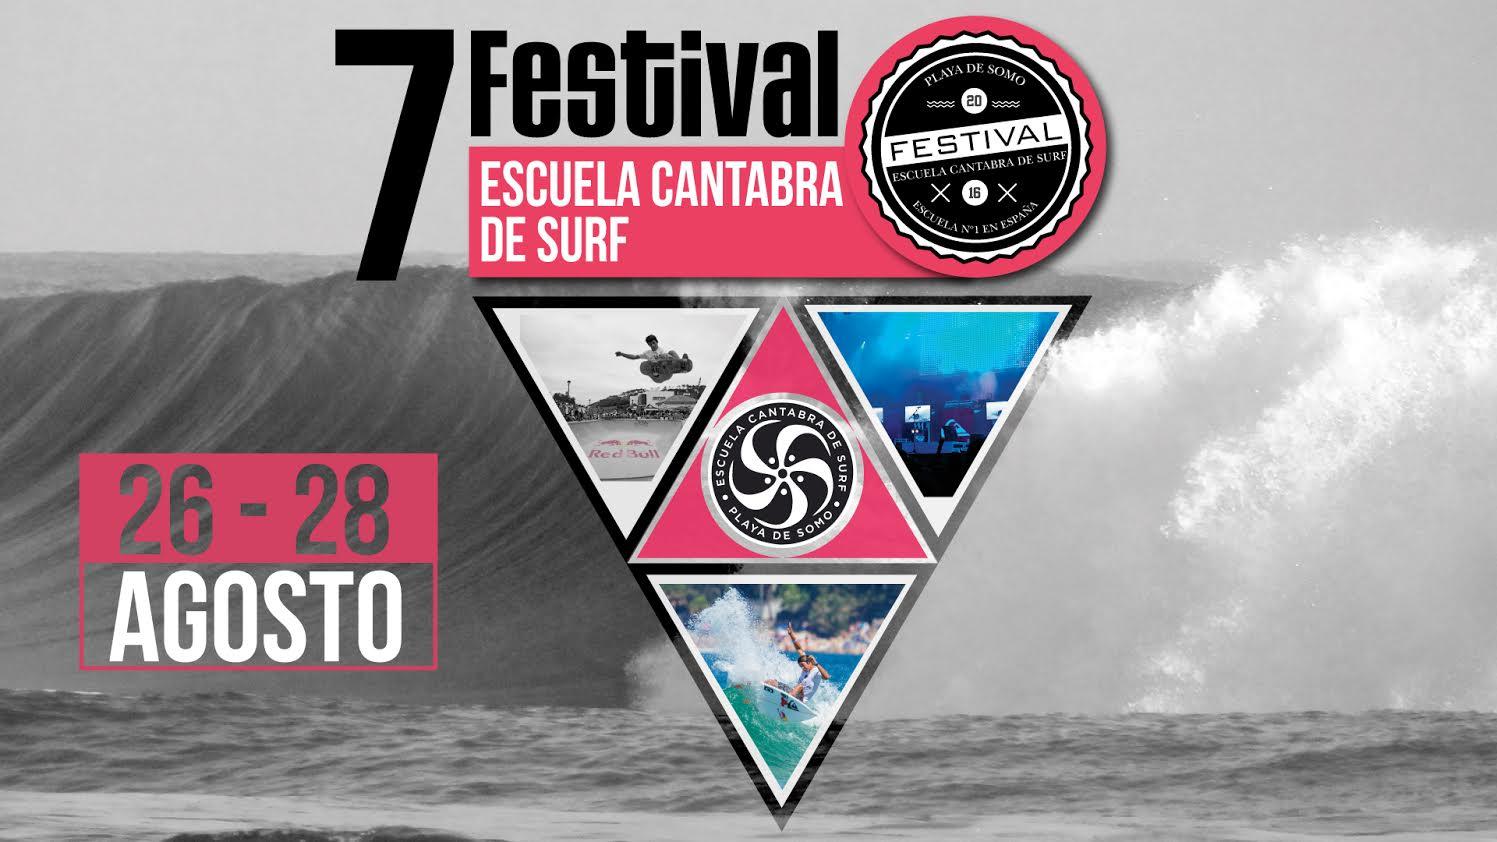 FESTIVAL-ESCUELA-CÁNTABRA-SURF